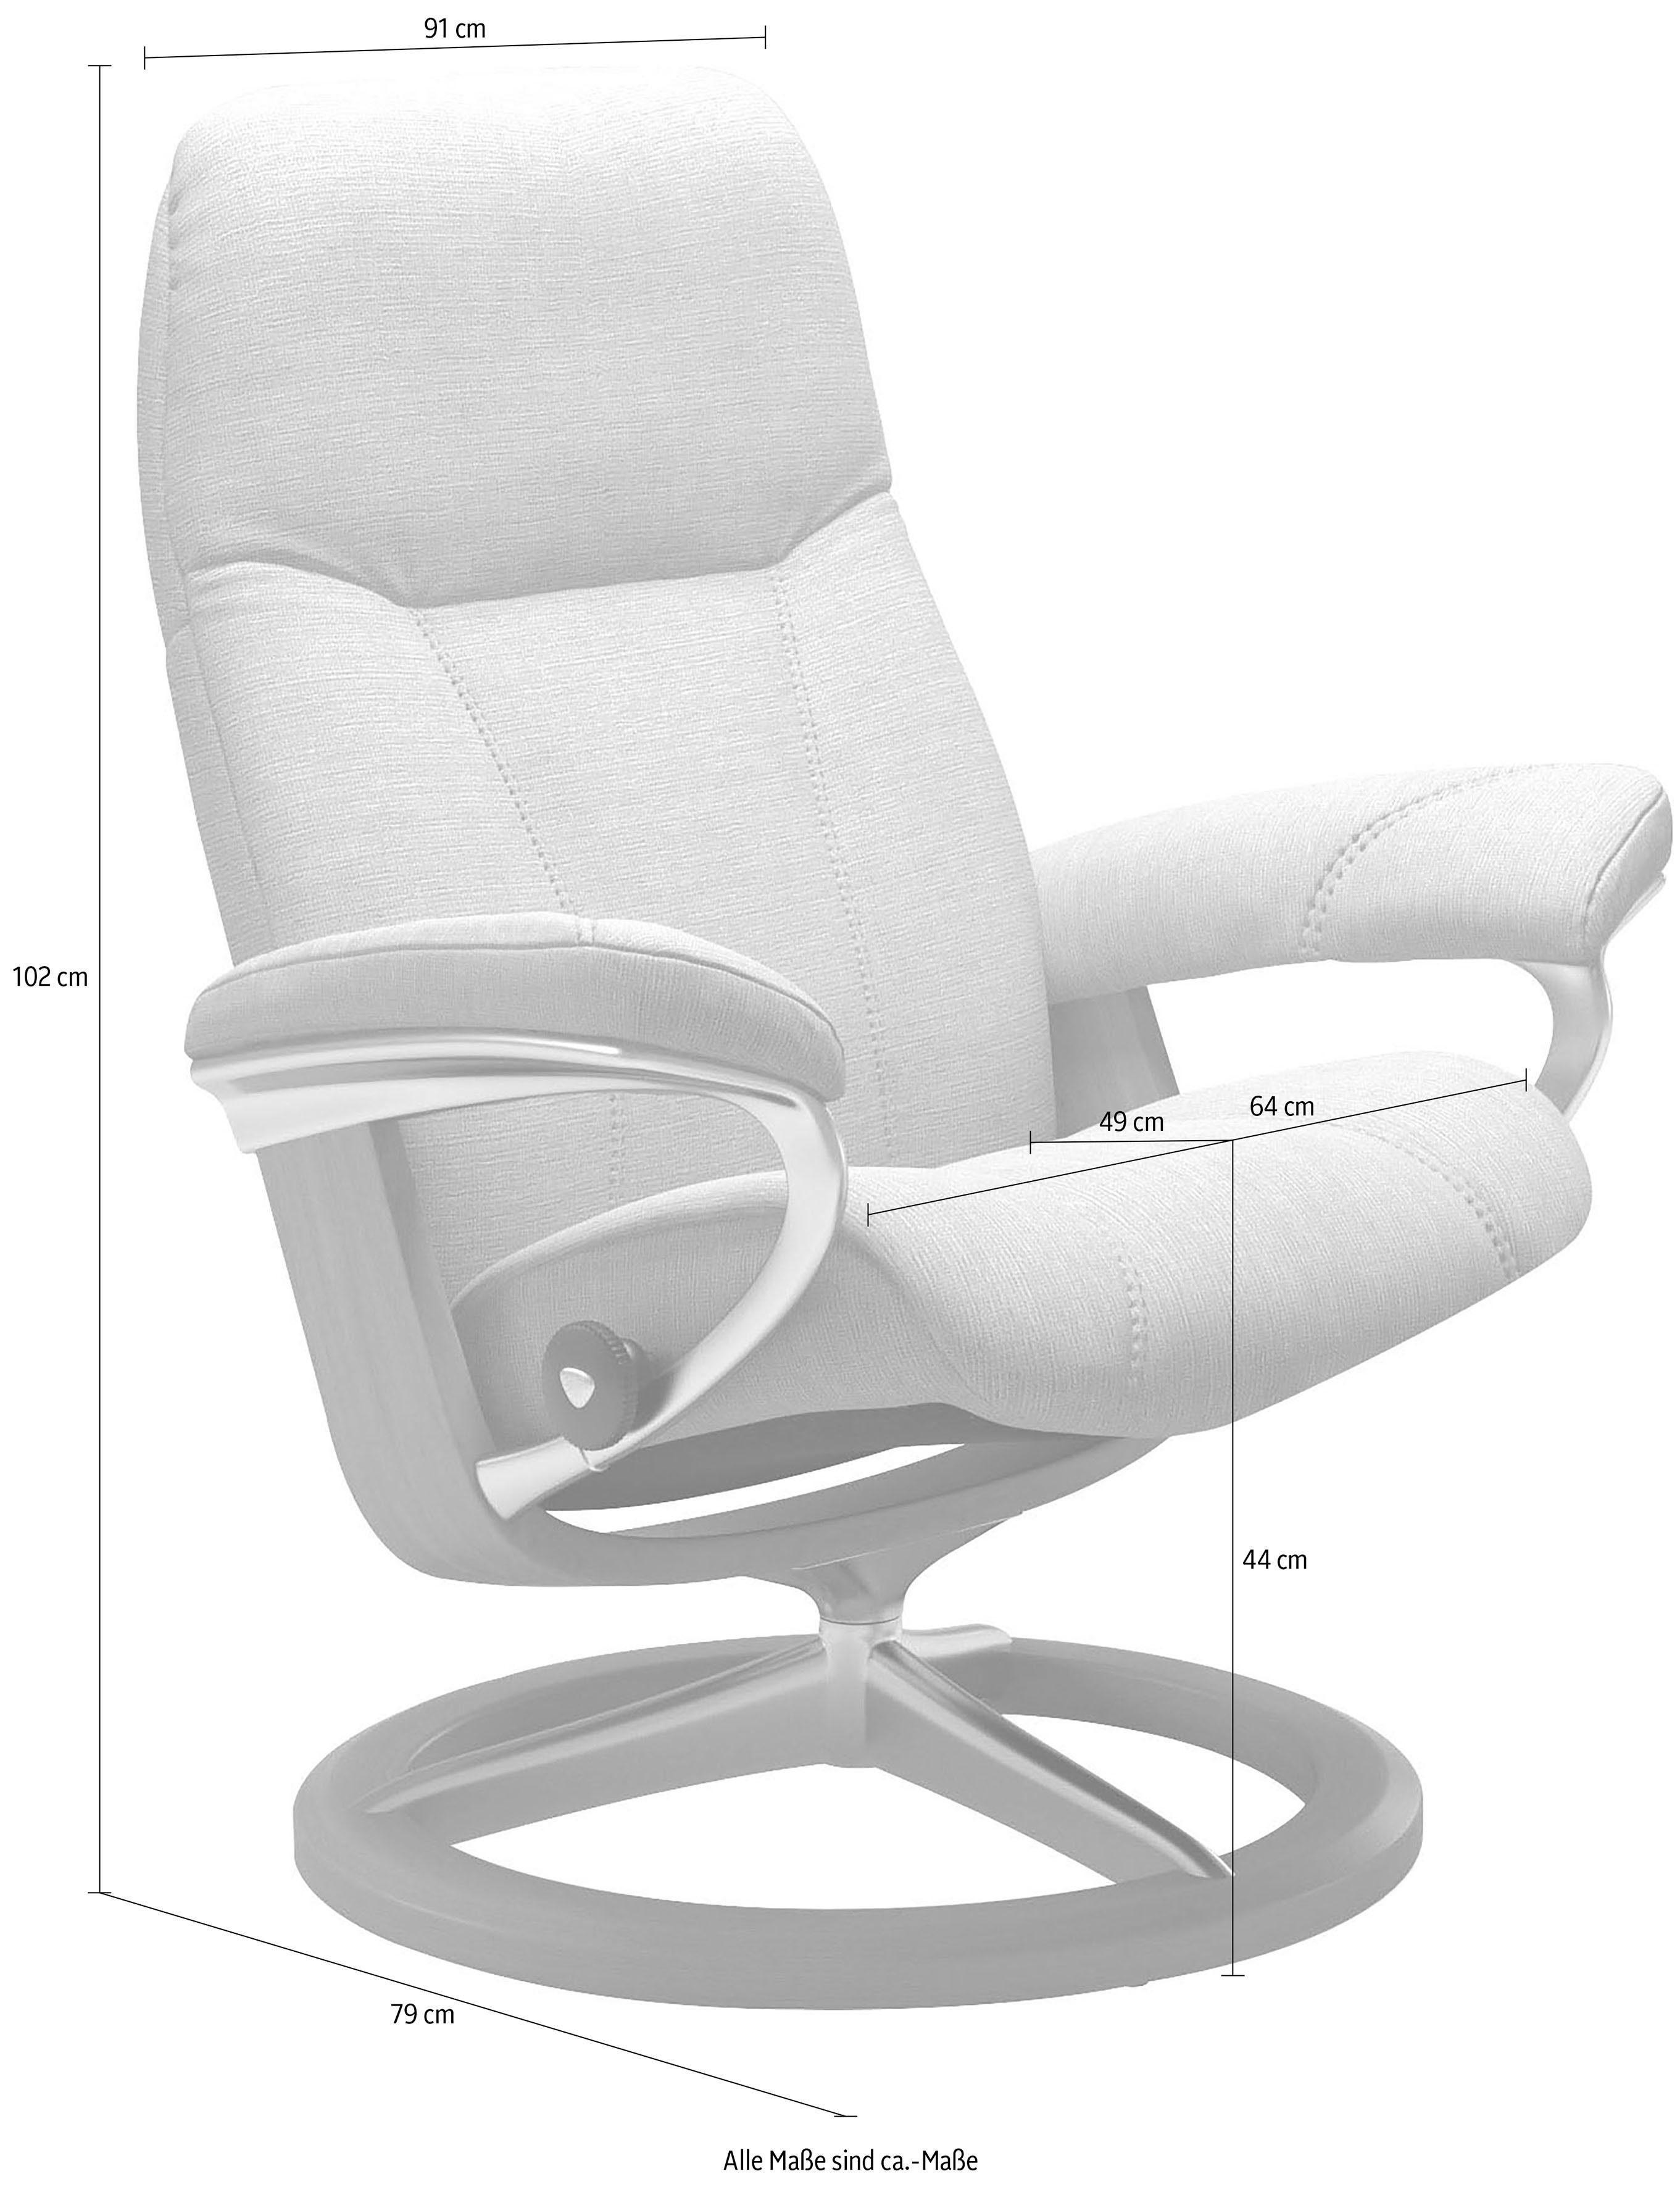 Stressless® Relaxsessel »Consul« mit Classic Base, Größe L, Gestell Whitewash